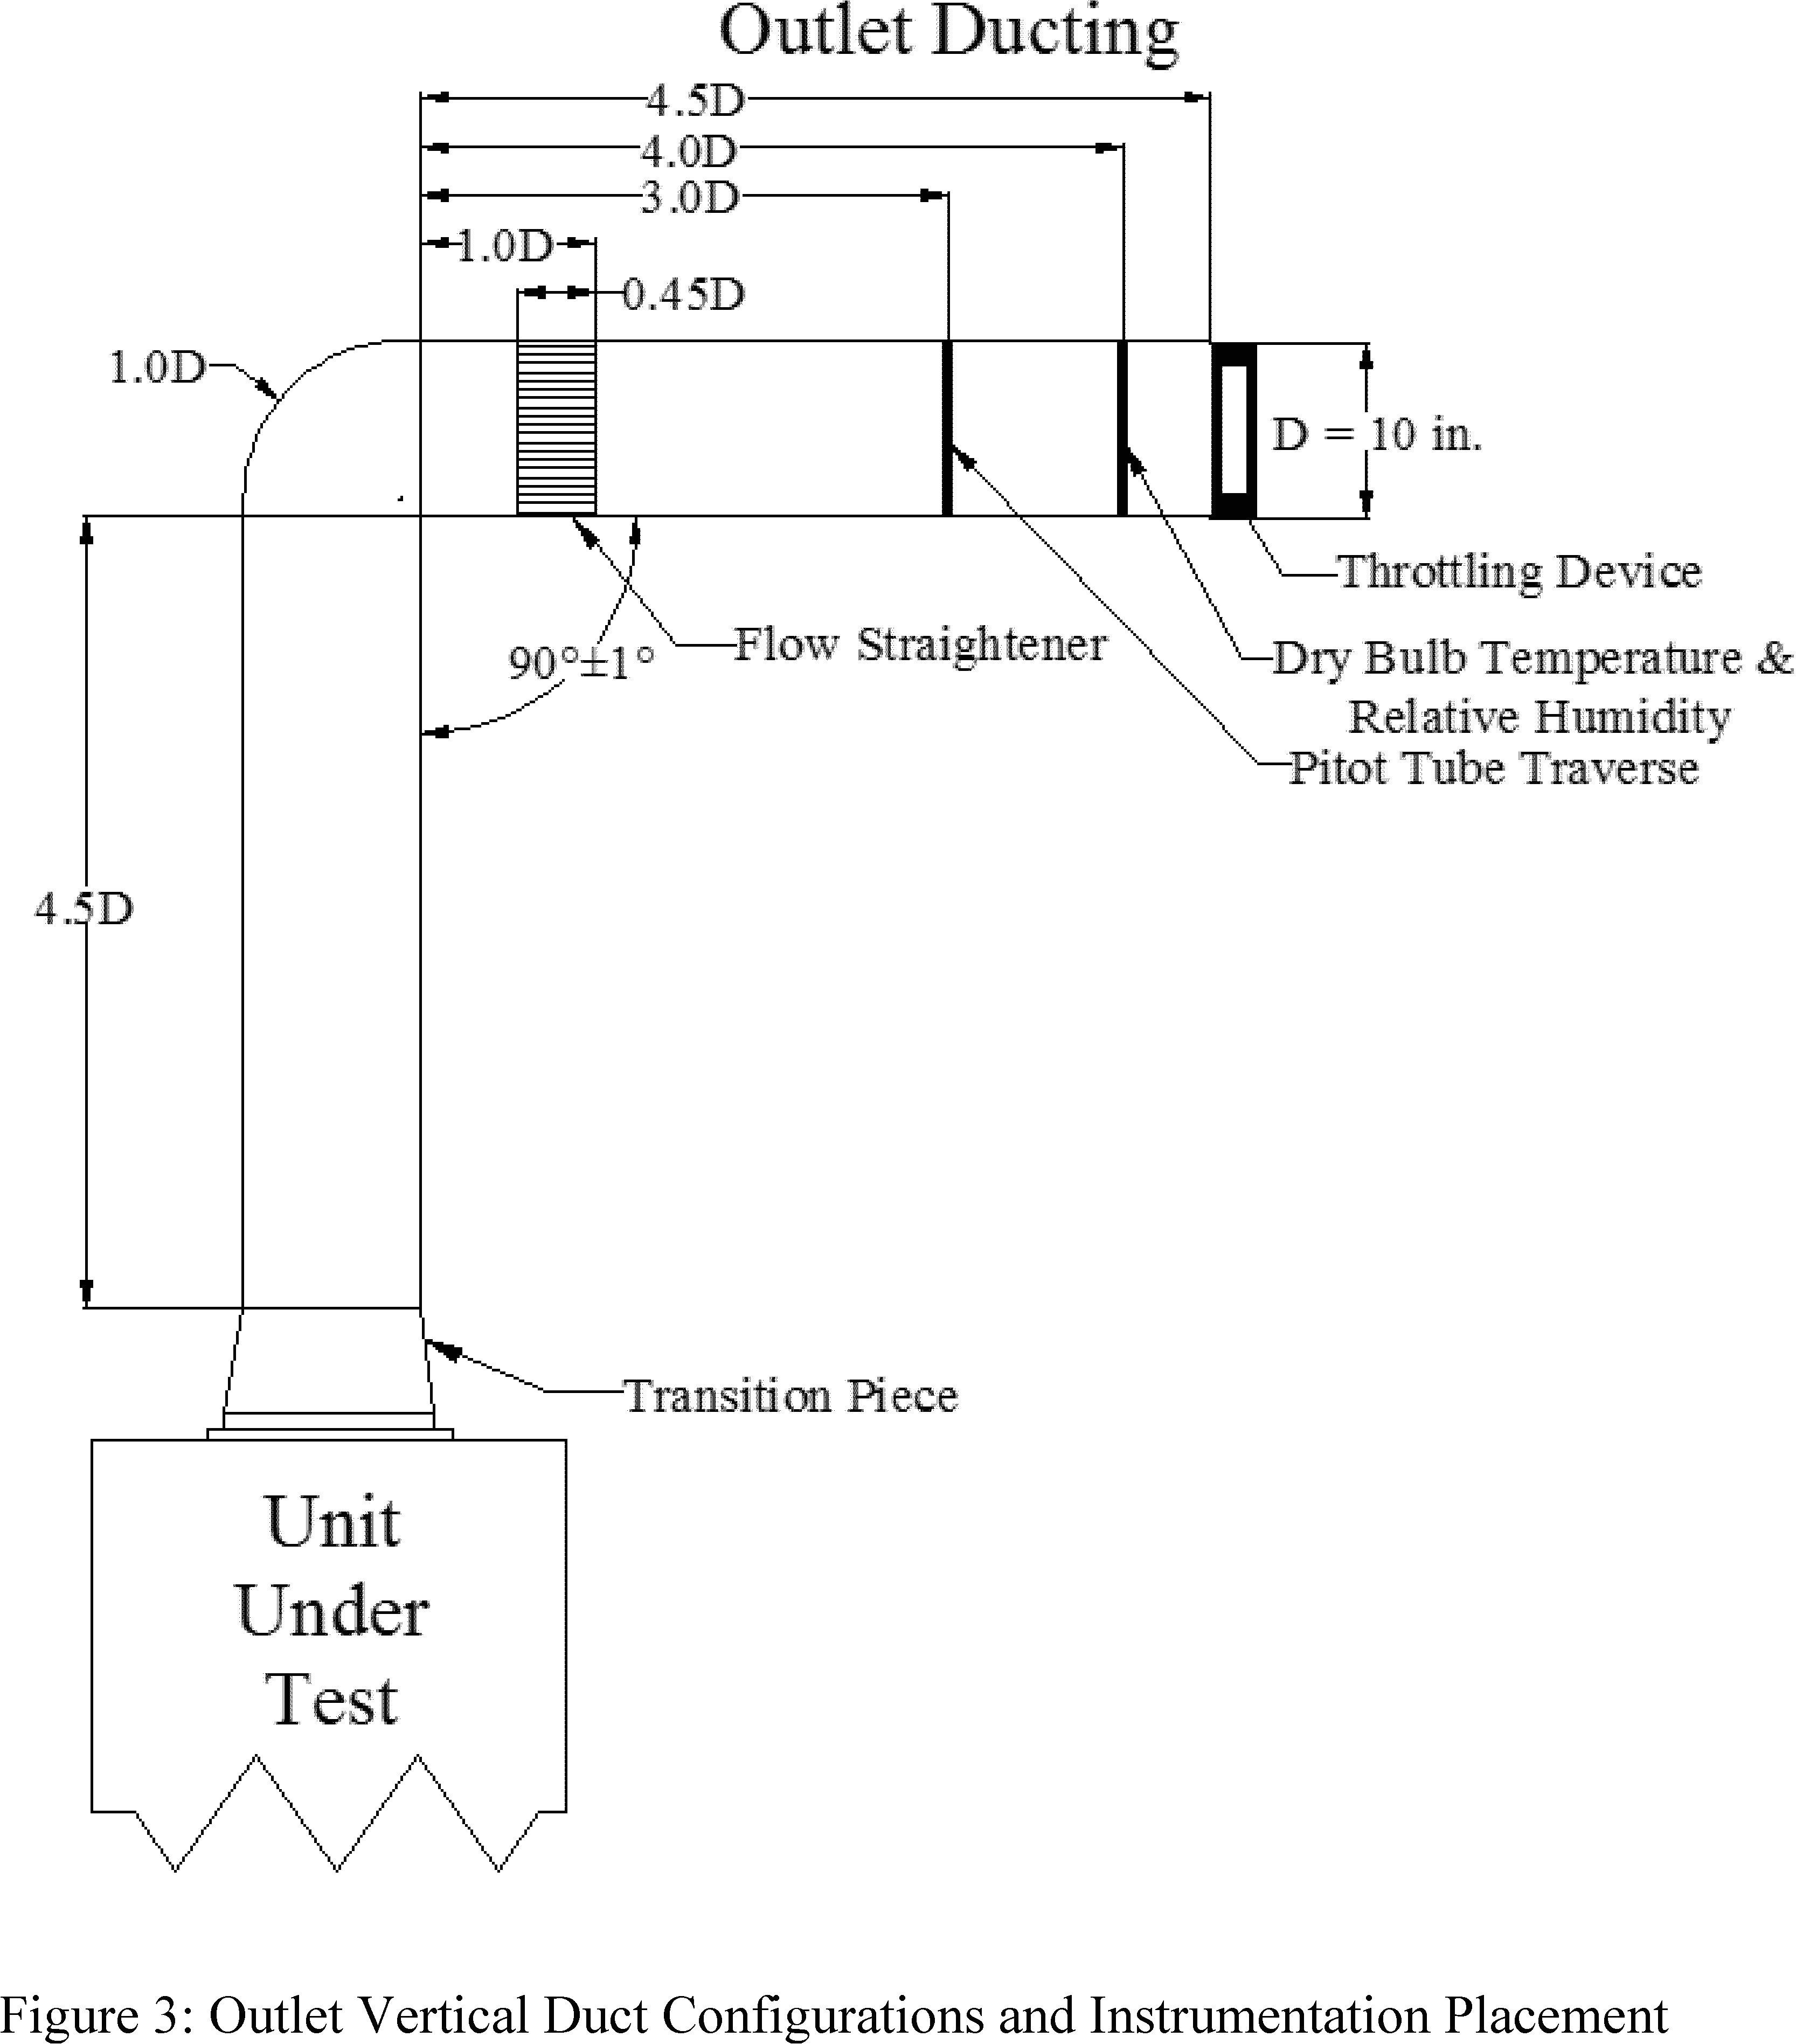 phono plug wiring diagram xlr to rca wiring diagram fresh xlr trs phono plug wiring diagram